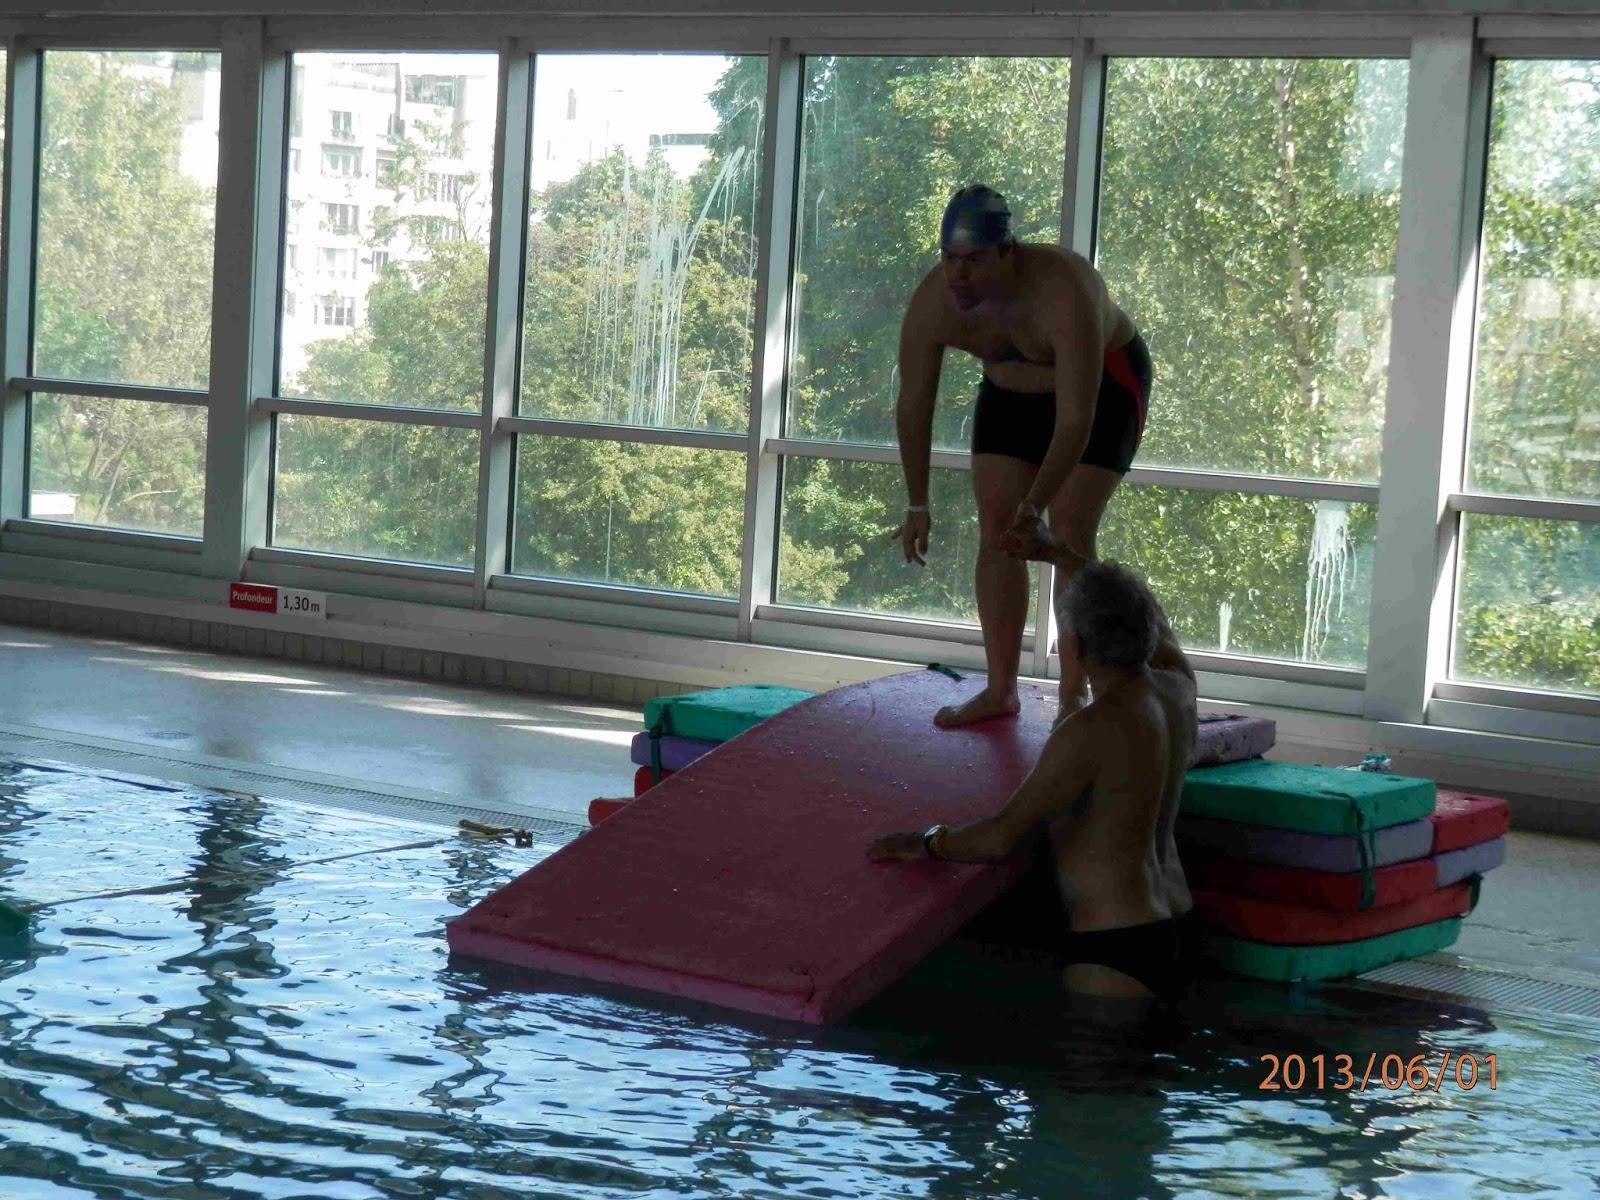 Sajh persan activites specifiques sportives juin 2013 for Piscine vanves